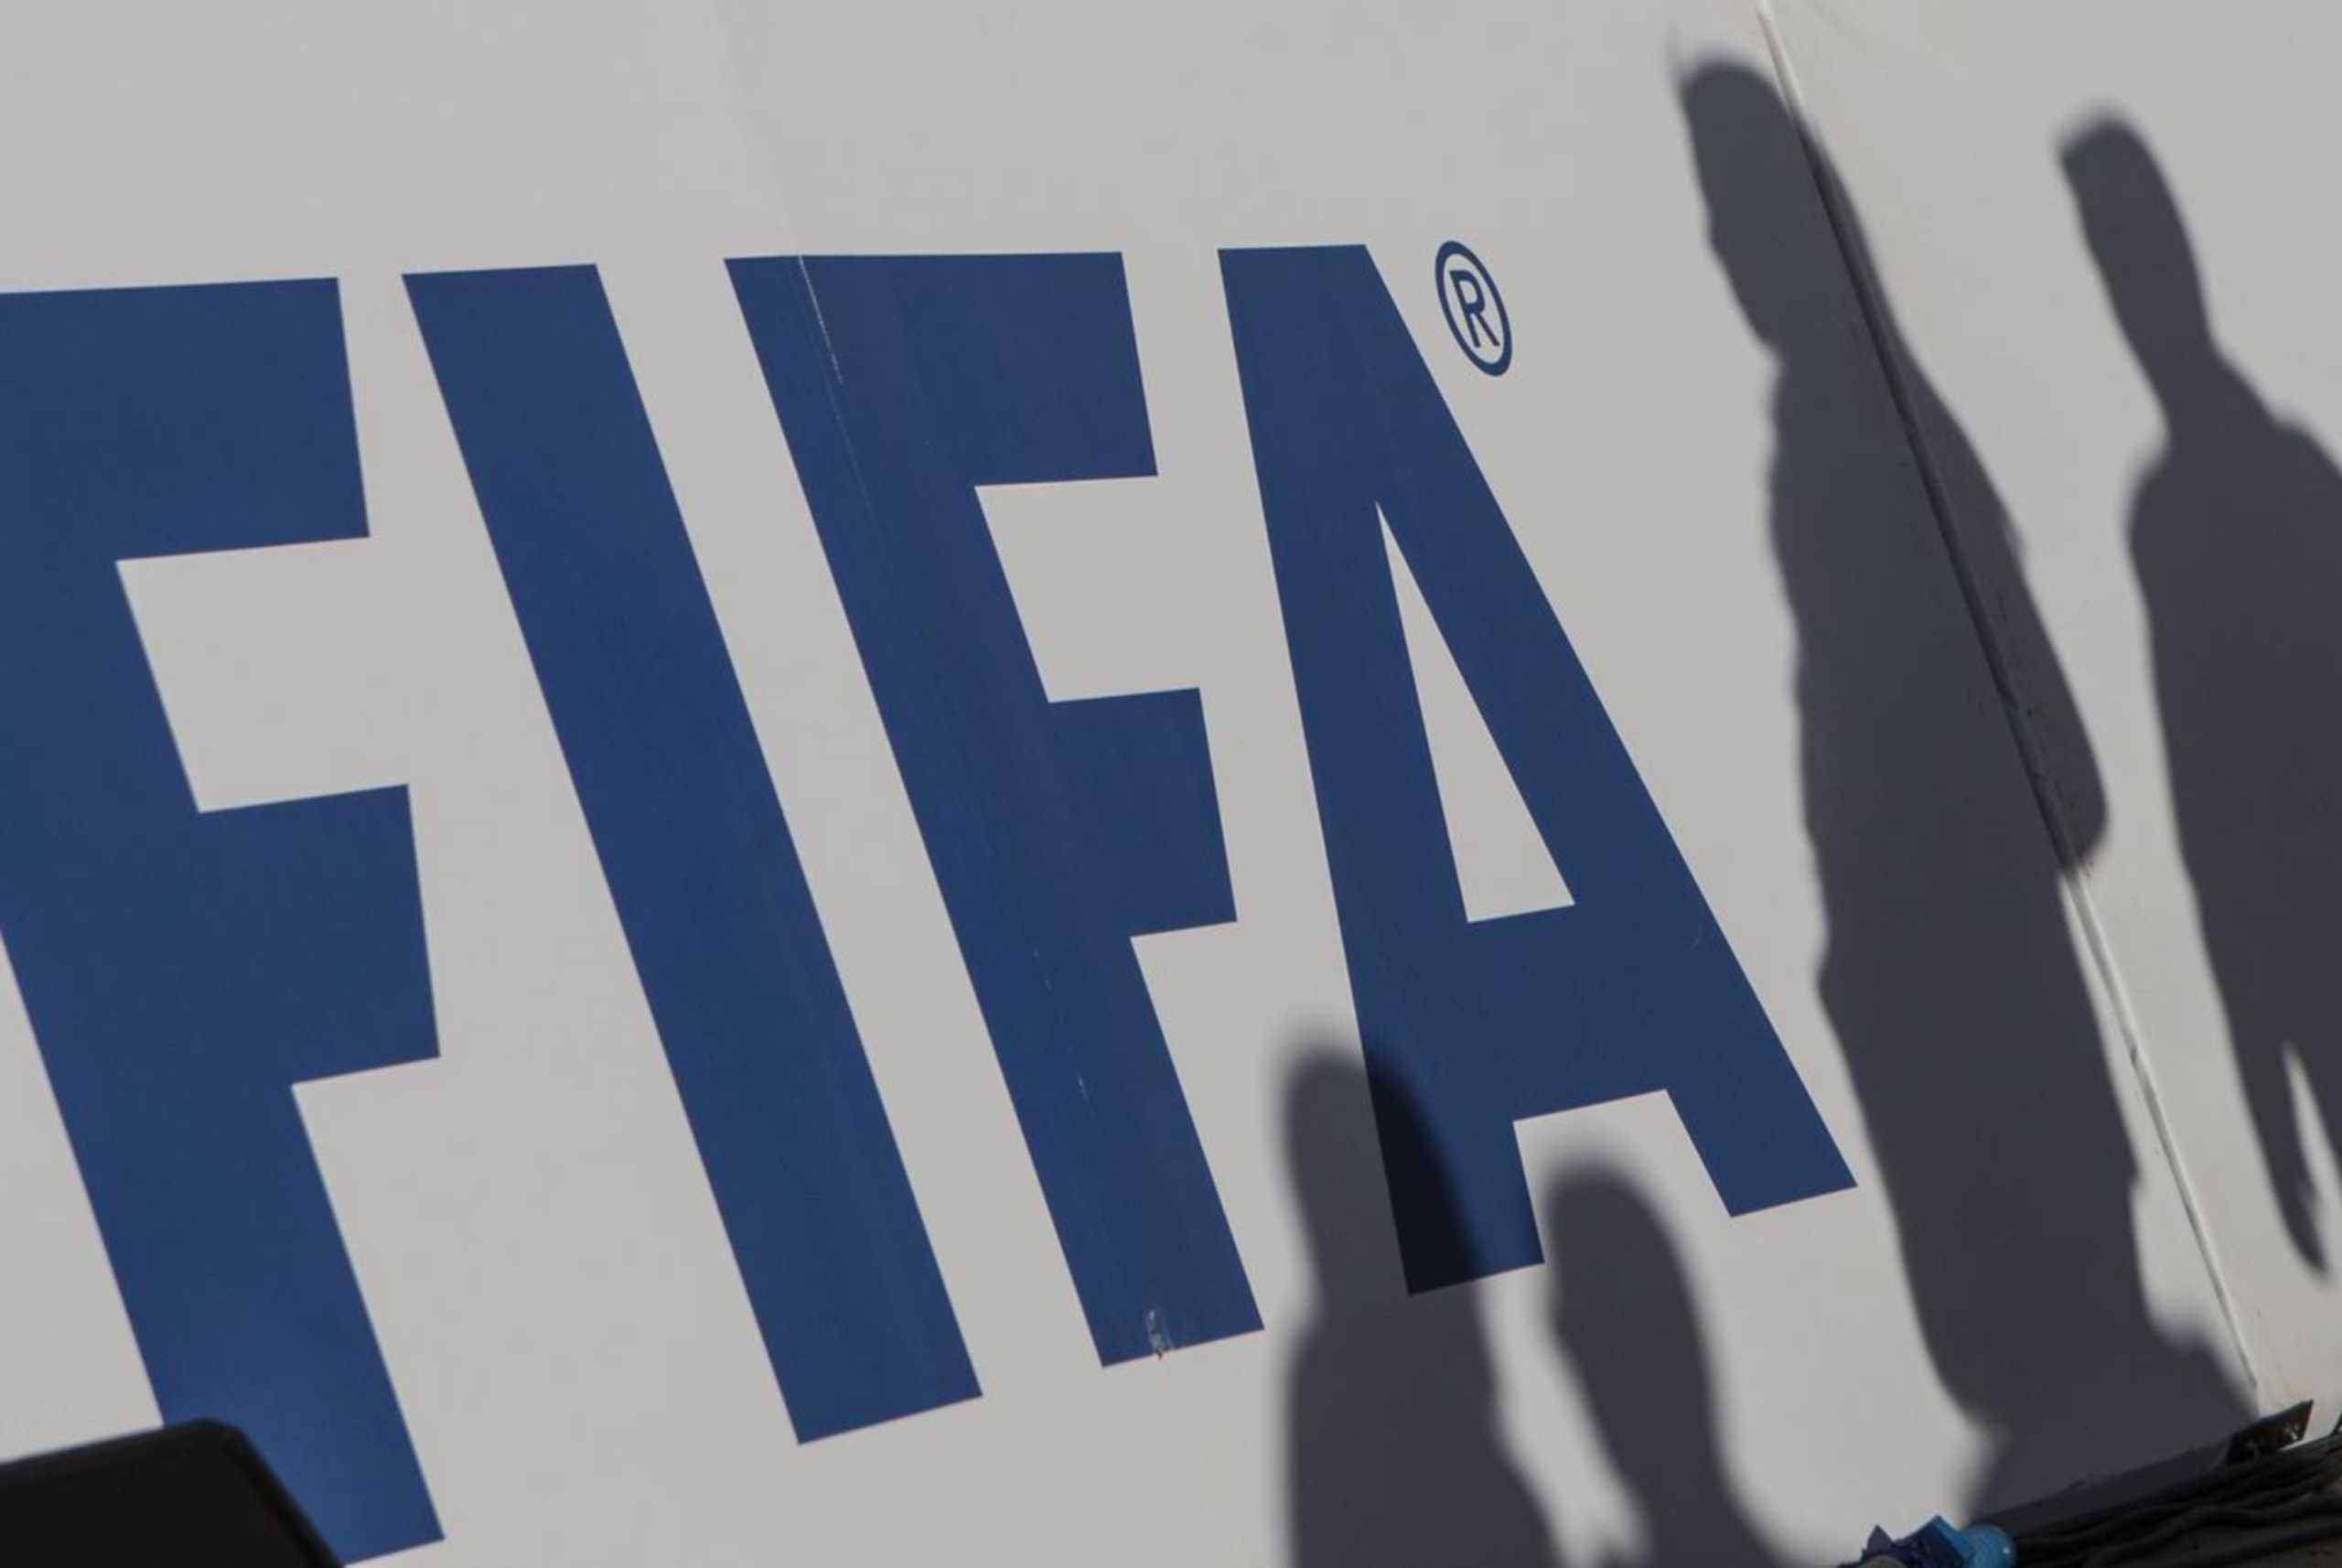 FIFA: «Απορρίπτουμε κάθε αποσχιστική τάση όπως η κλειστή λίγκα» – Με αποκλεισμούς απειλεί η UEFA